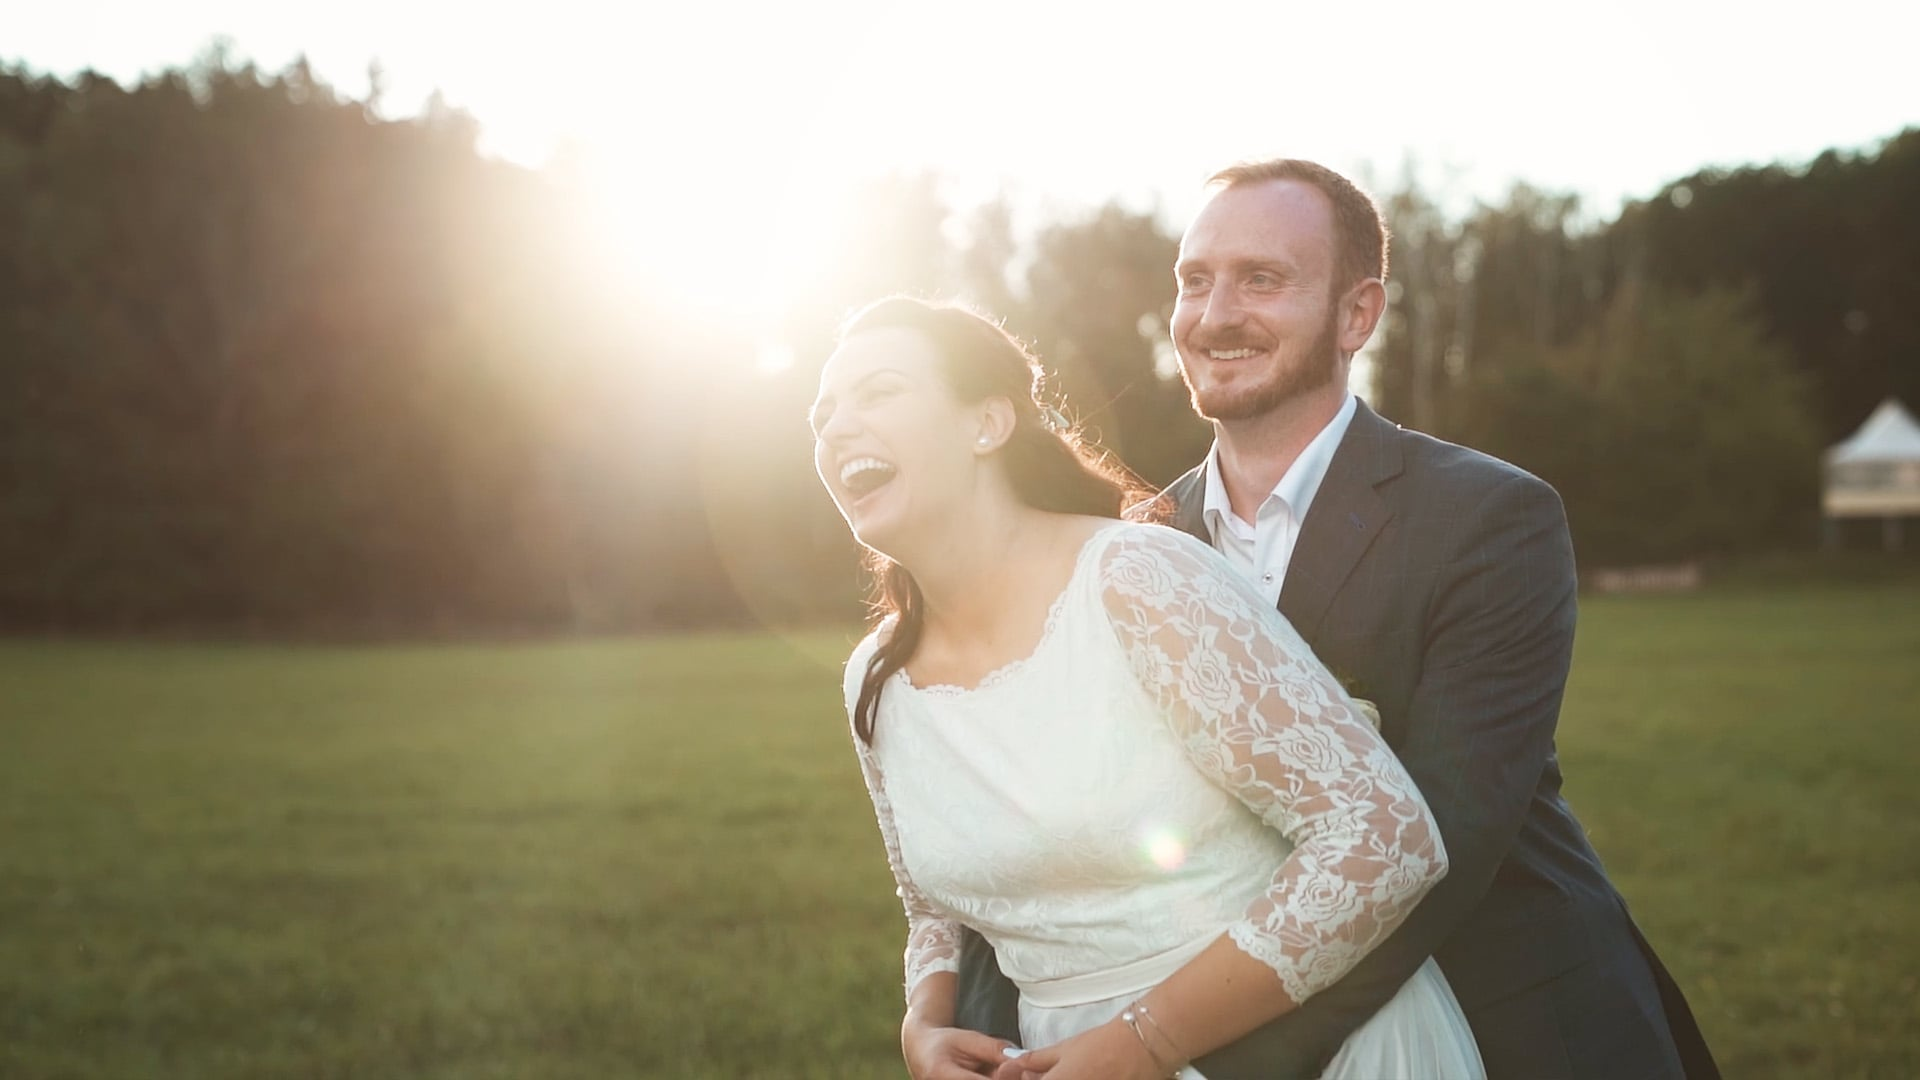 Svatební den: Lenka a Jakub / Penzion Alwin, Chlumec nad Cidlinou